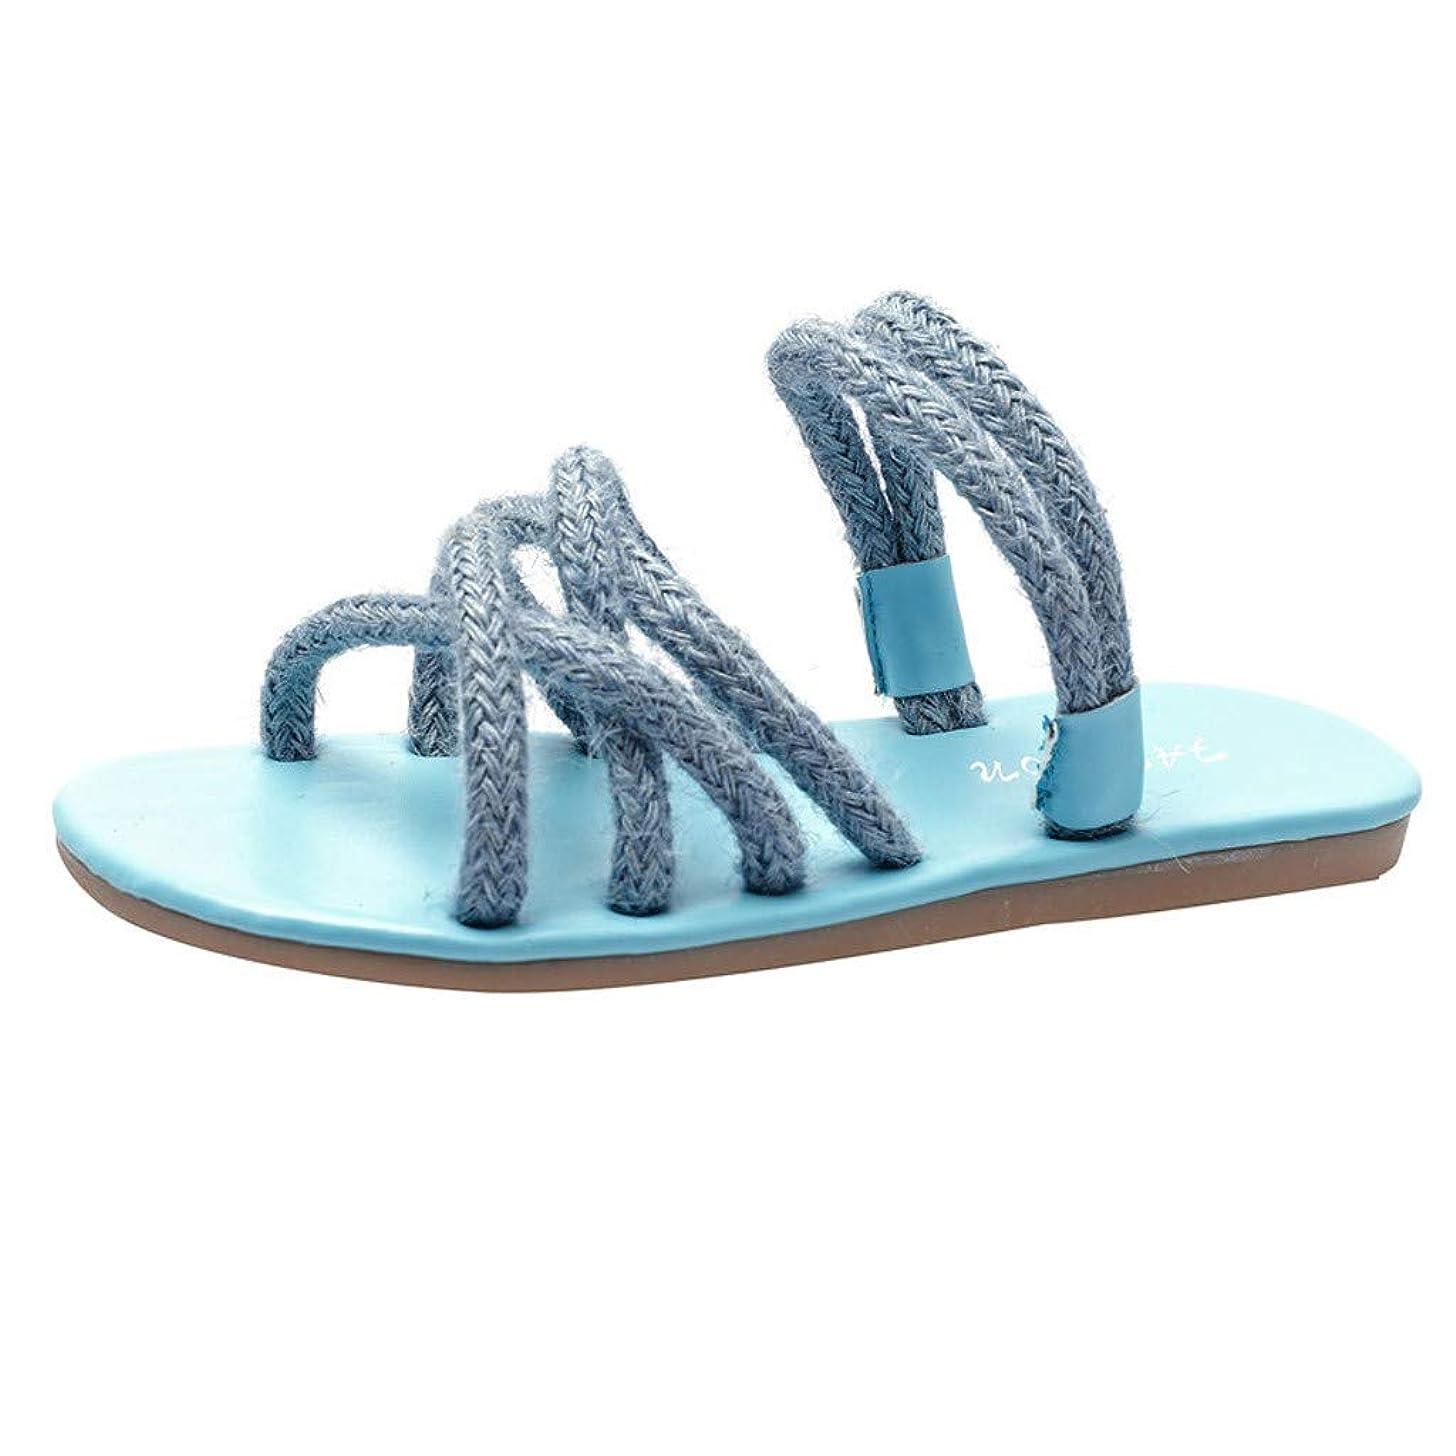 Women's Fashion Suede Cross Strap Beach Walking Flats Shoes Slip On Slippers Casual Open Toe Sandals JHKUNO